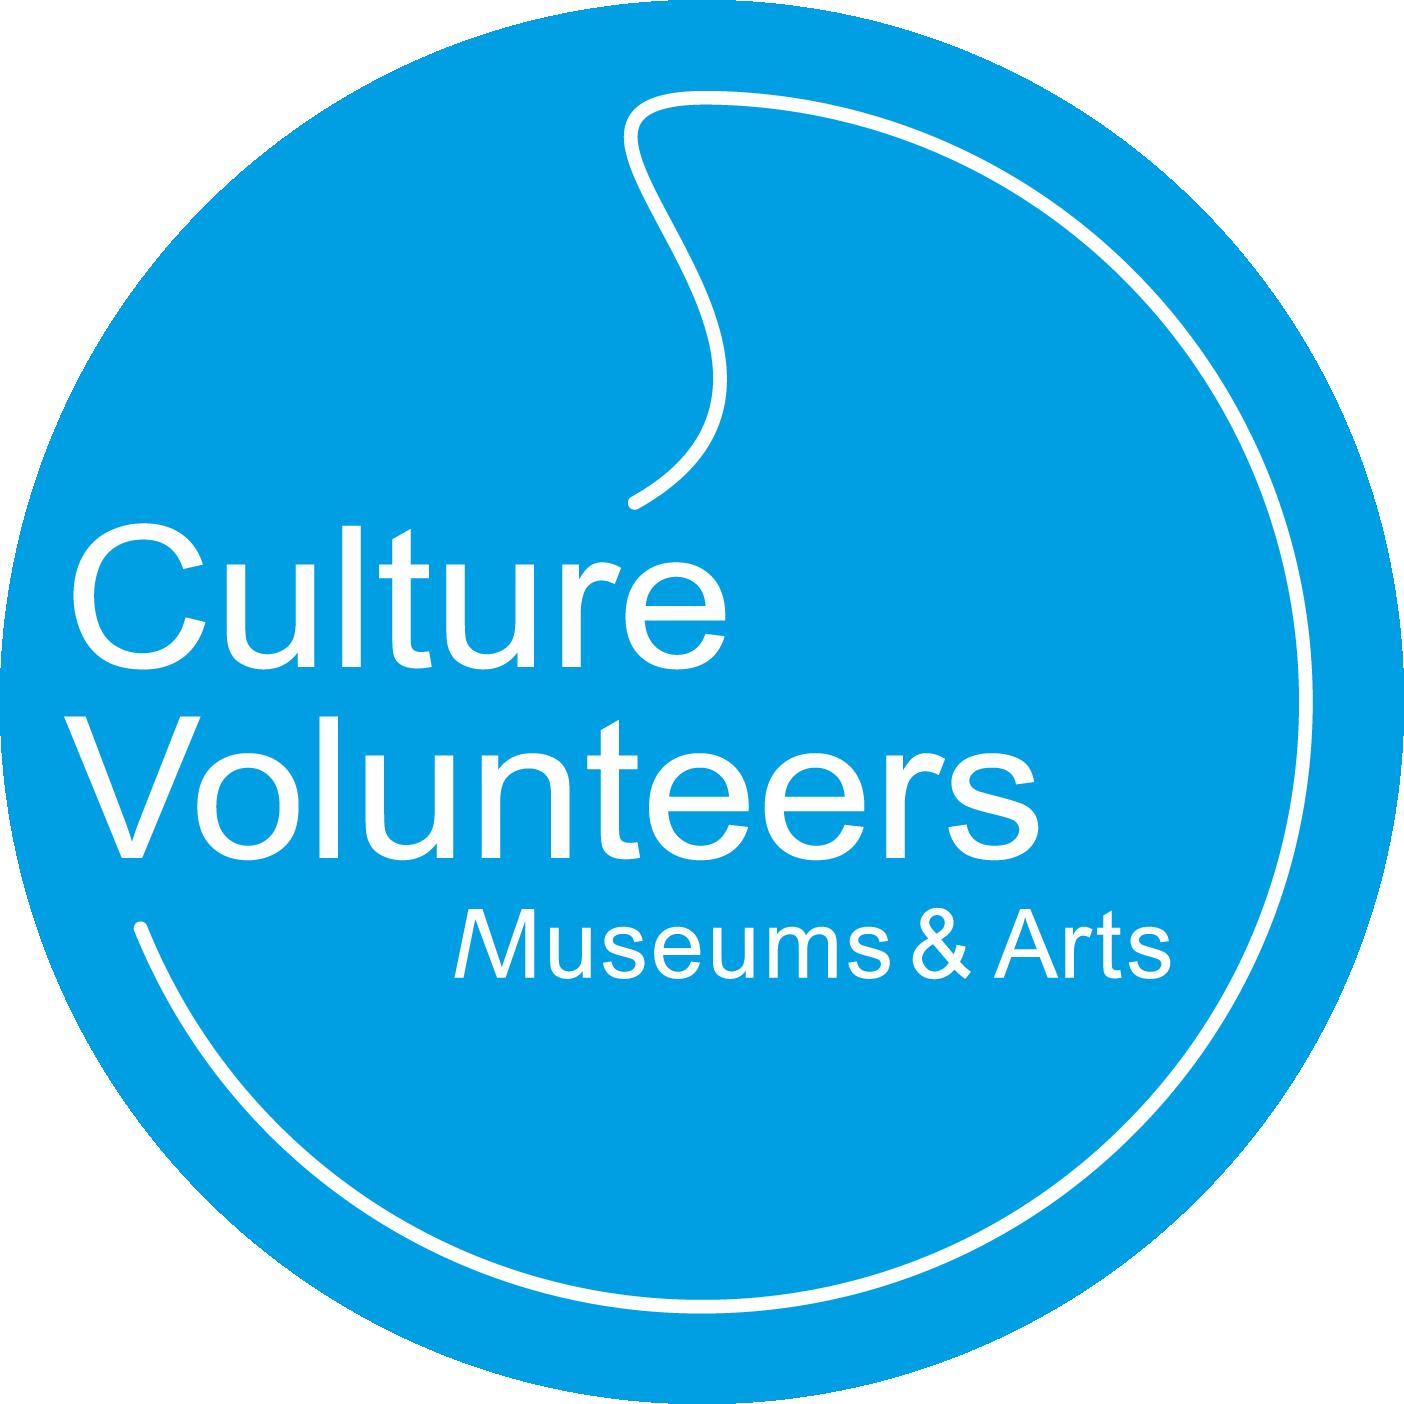 Culture Volunteers